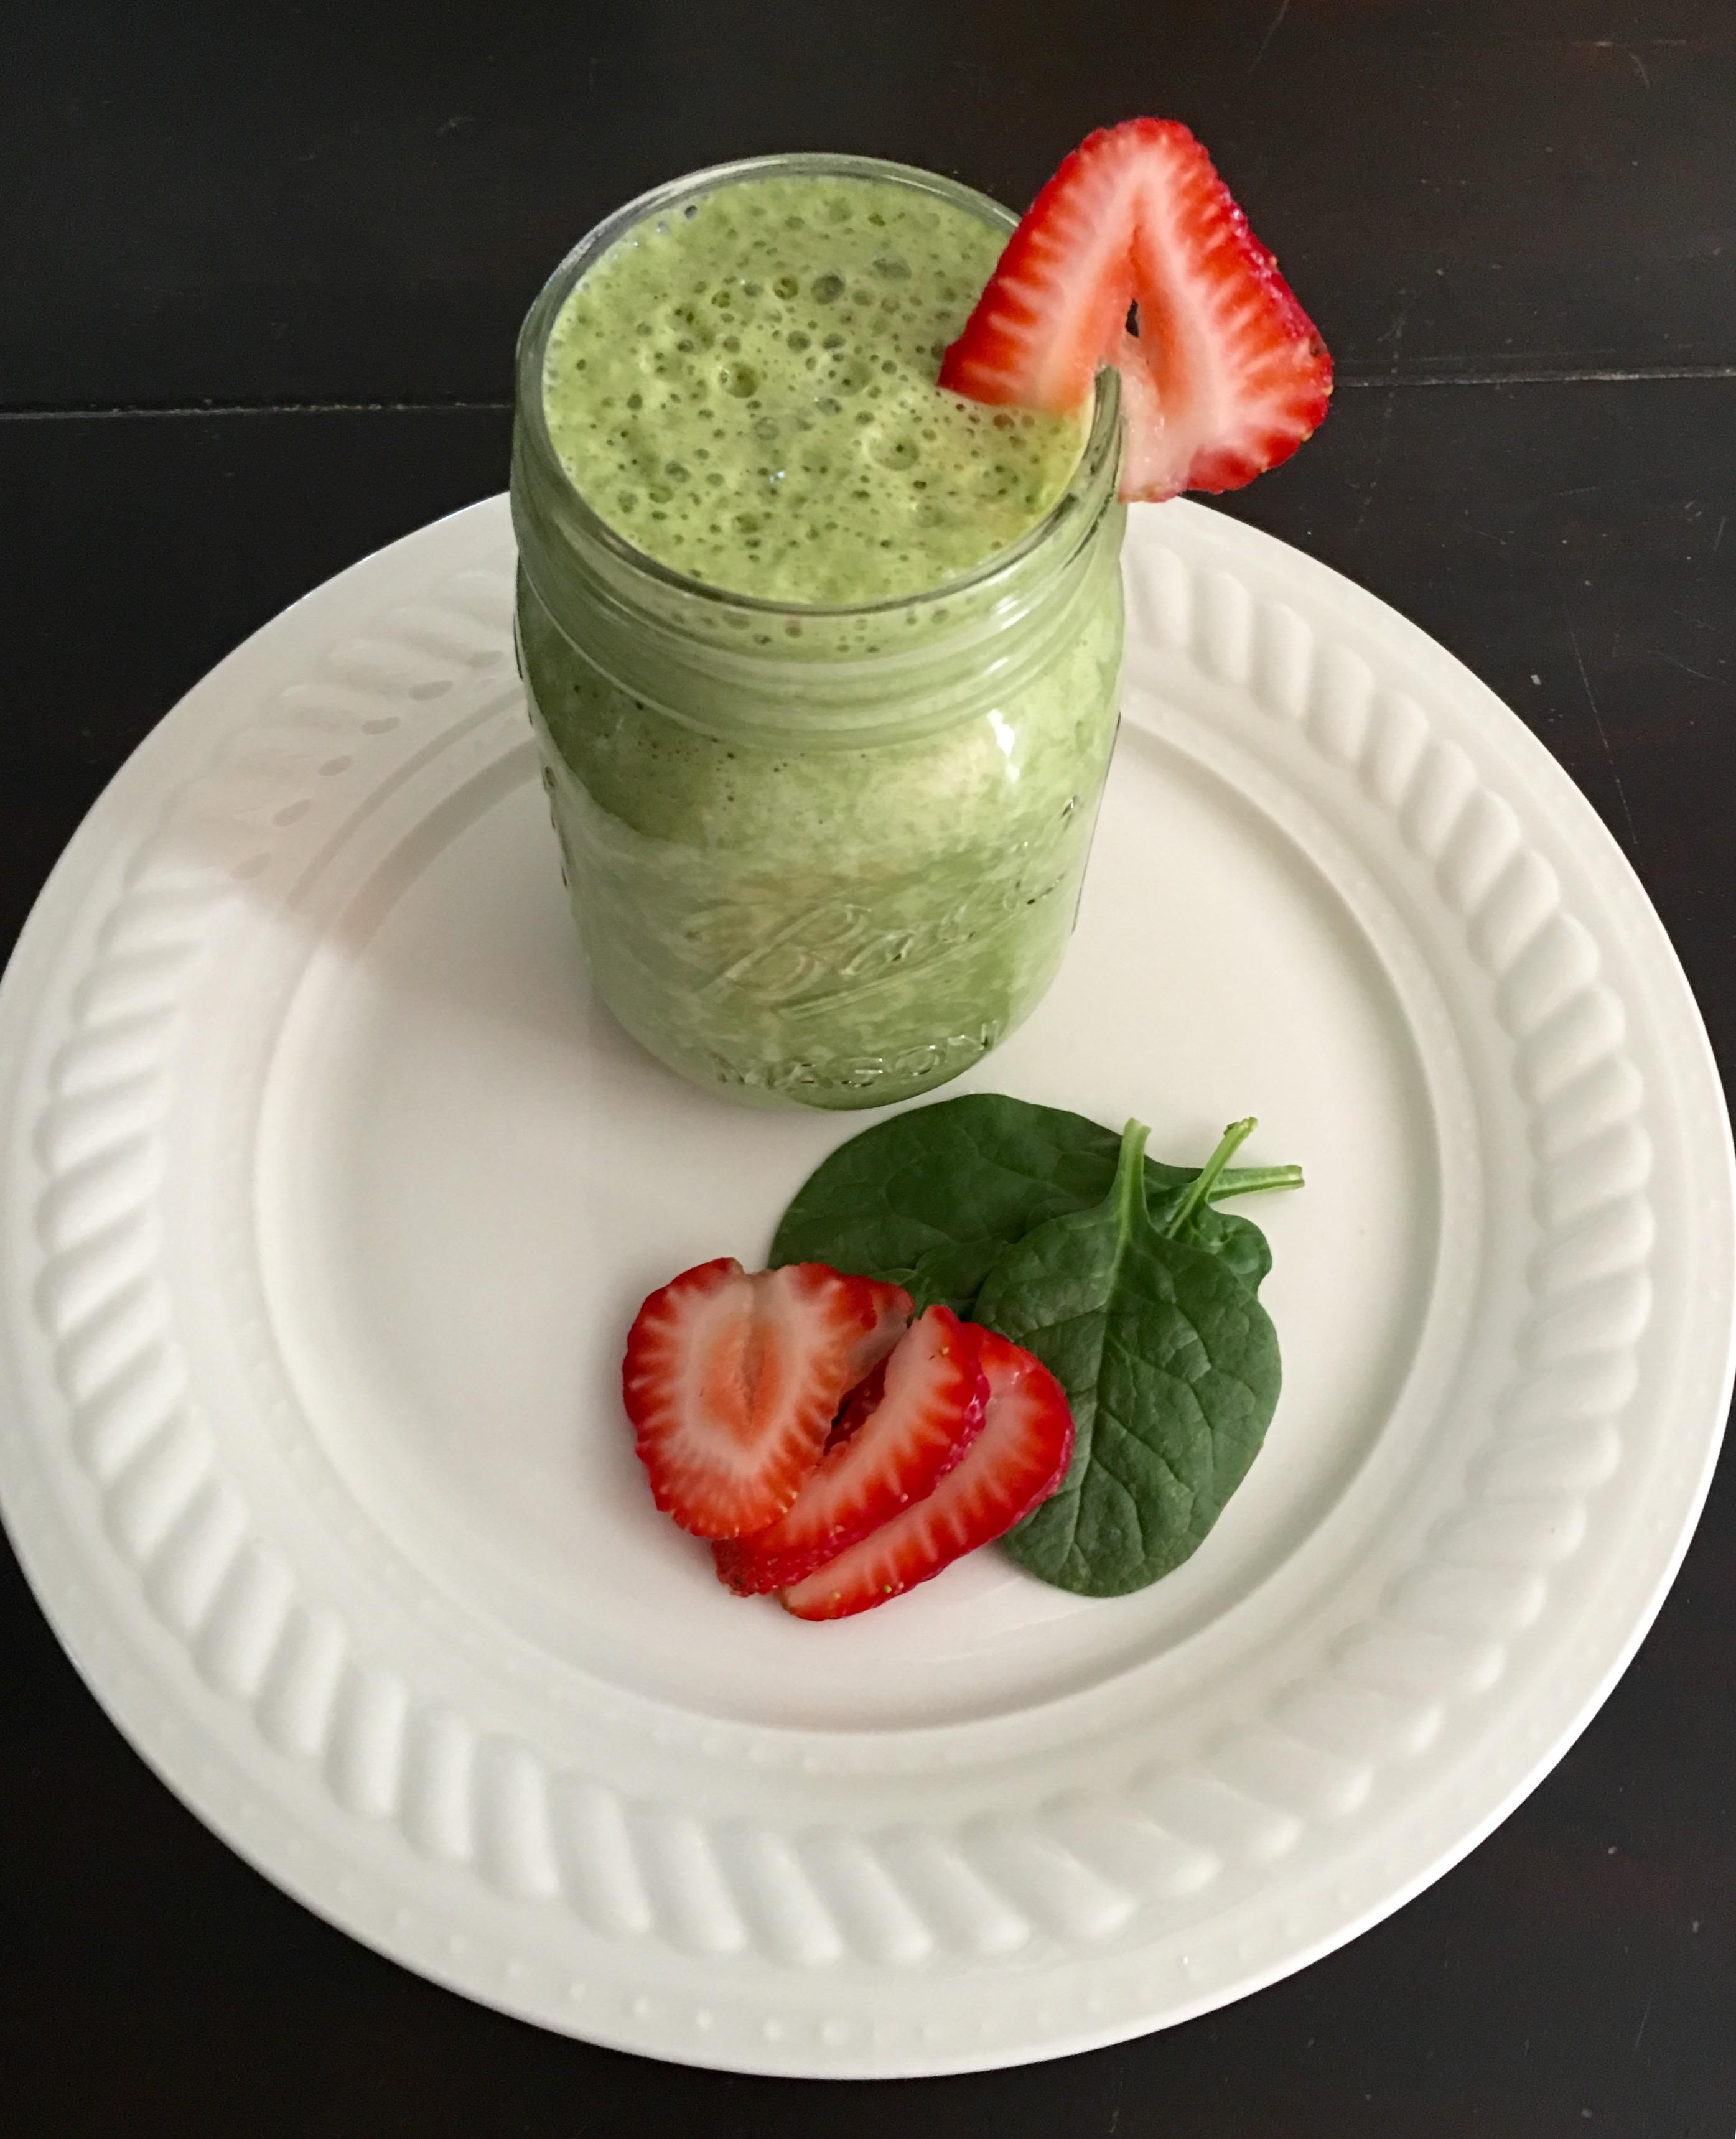 Skinny Vegan Green Smoothie